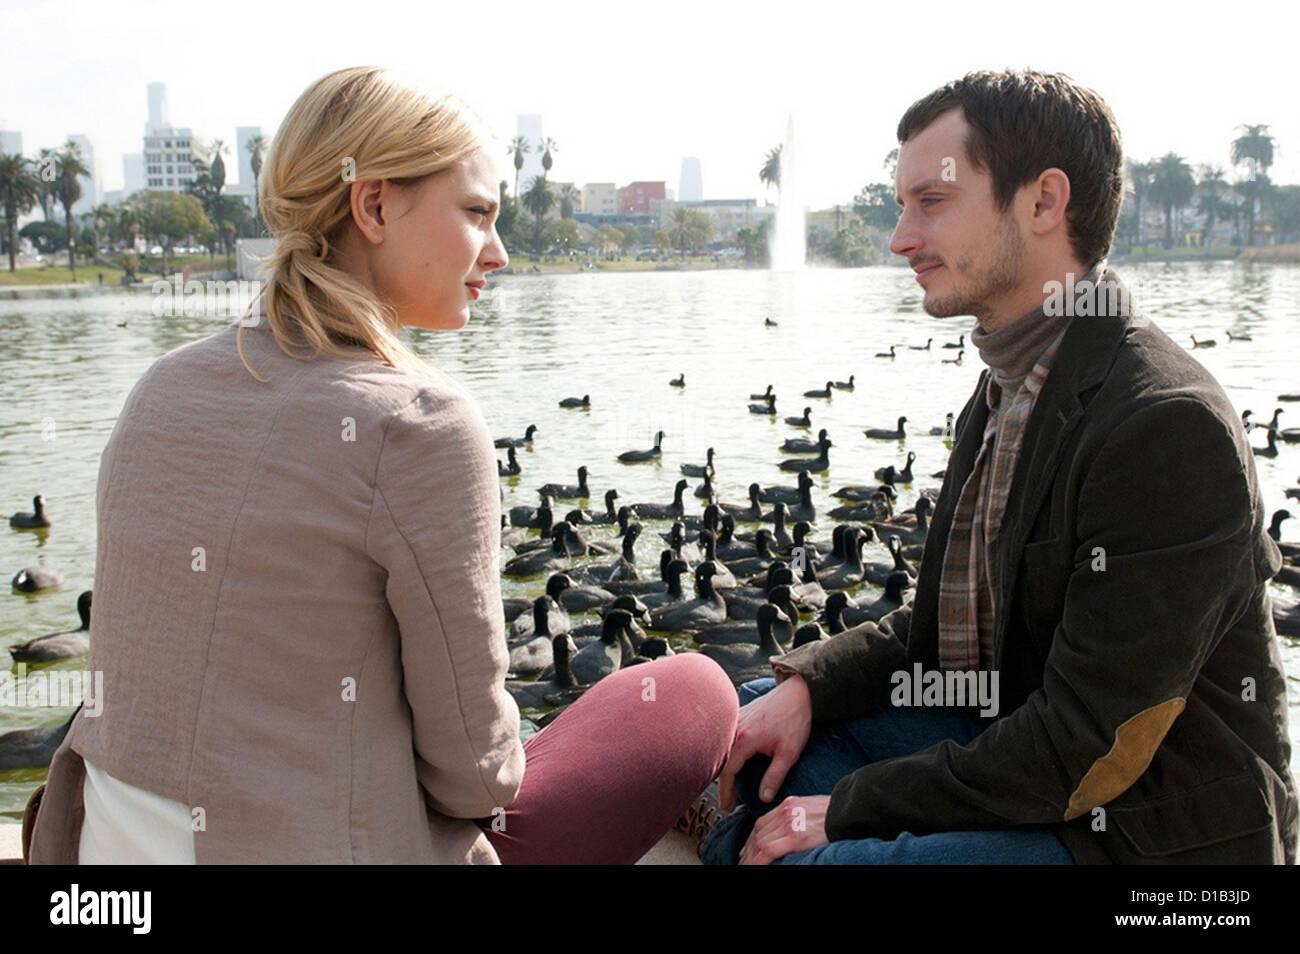 MIDNIGHT'S MANIAC 2013 IFC film with Nora Arnezeder as Anna and Elijah Wood as Frank - Stock Image